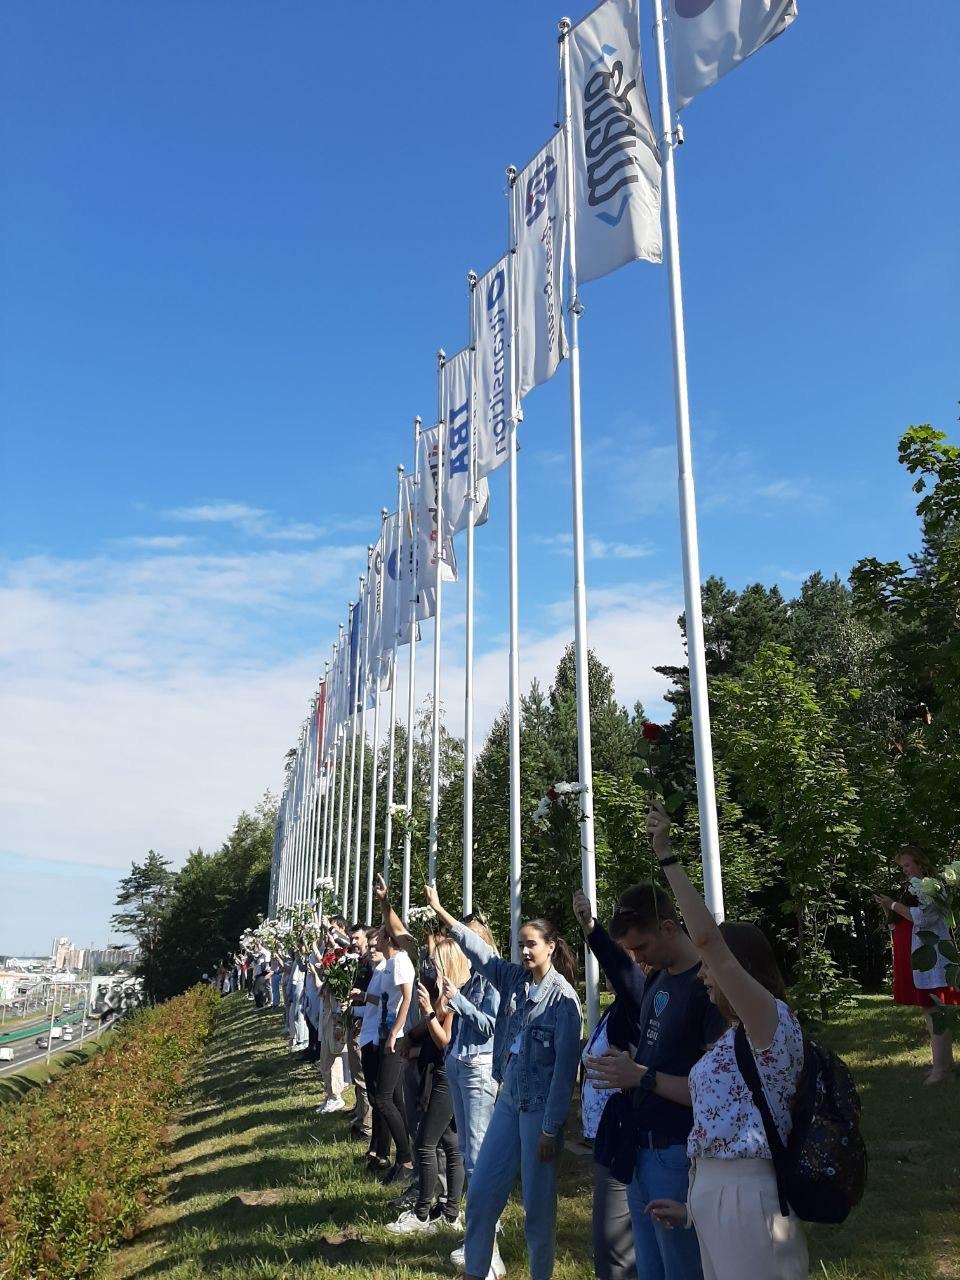 Сотрудники Парка высоких технологий протестуют в Минске. Фото: Telegram-канал